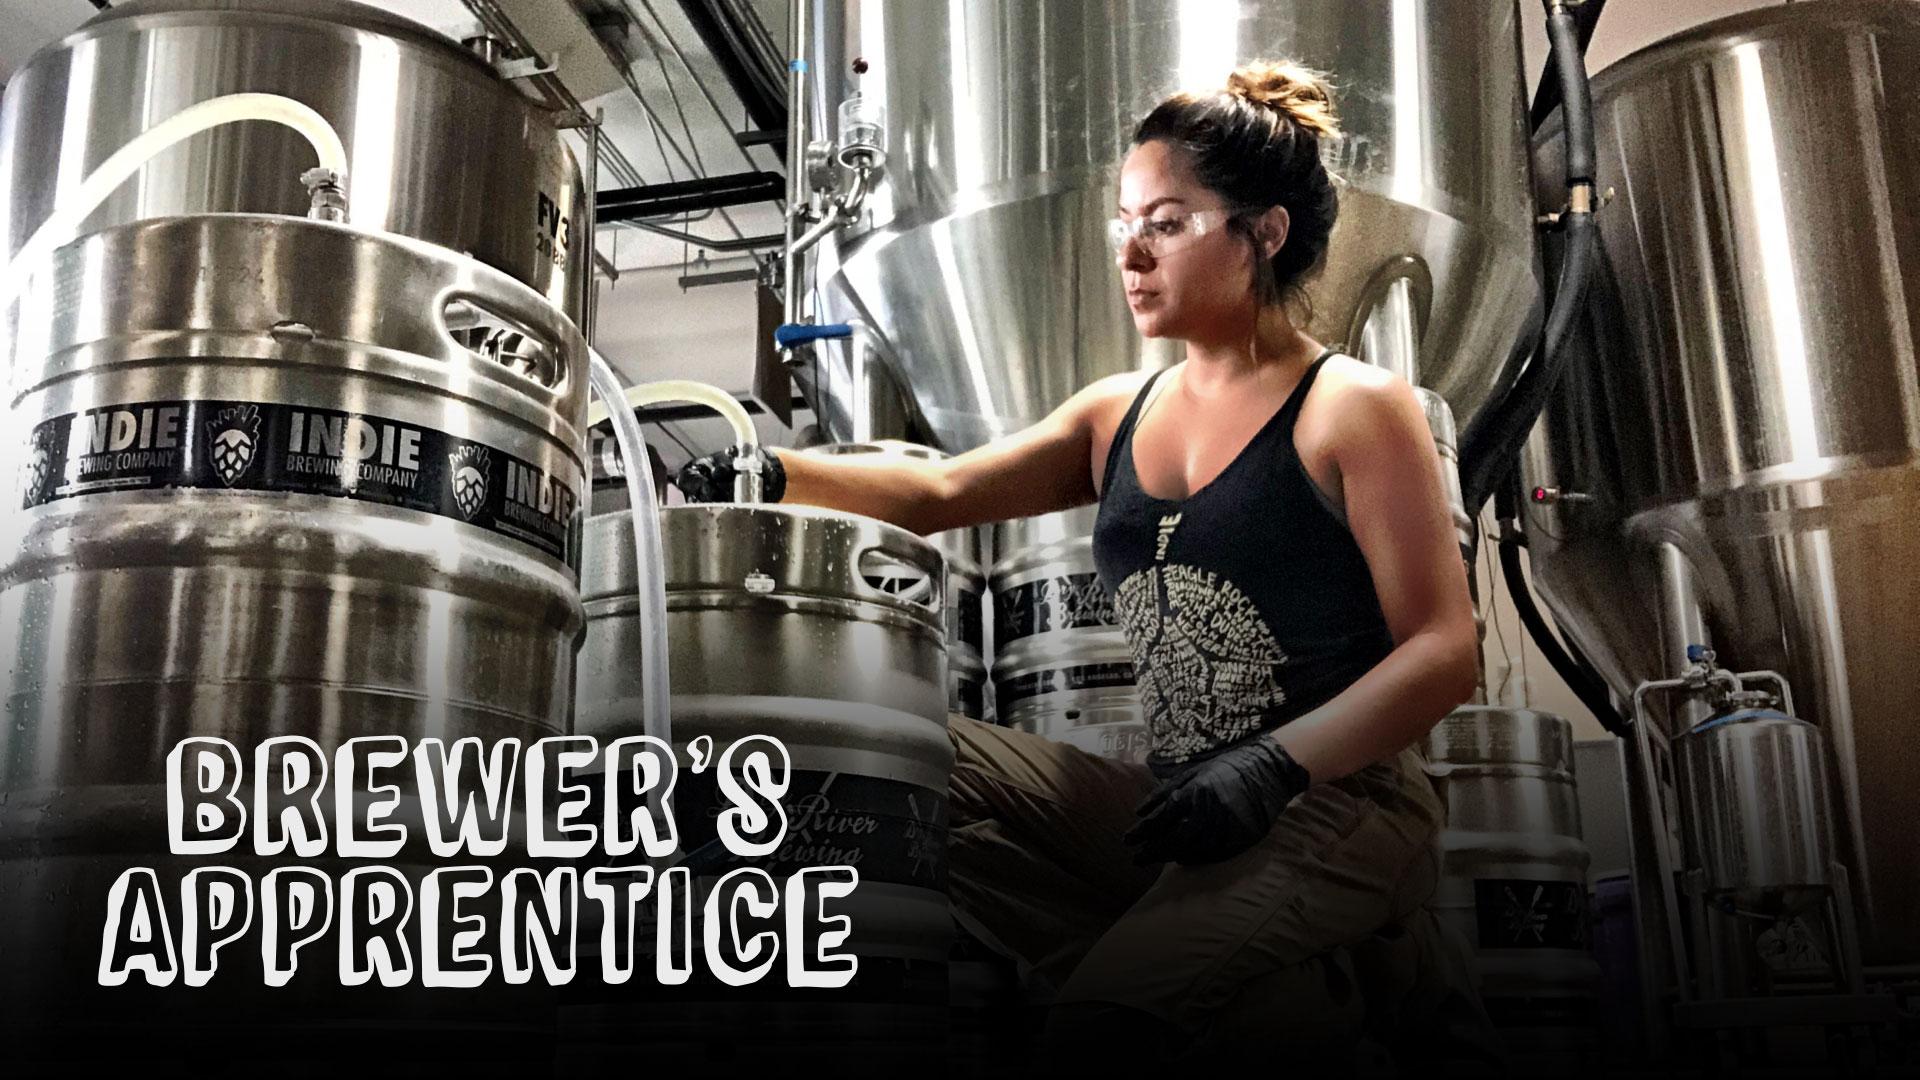 BrewersApprentice-Widescreen-1920x1080_00000.jpg